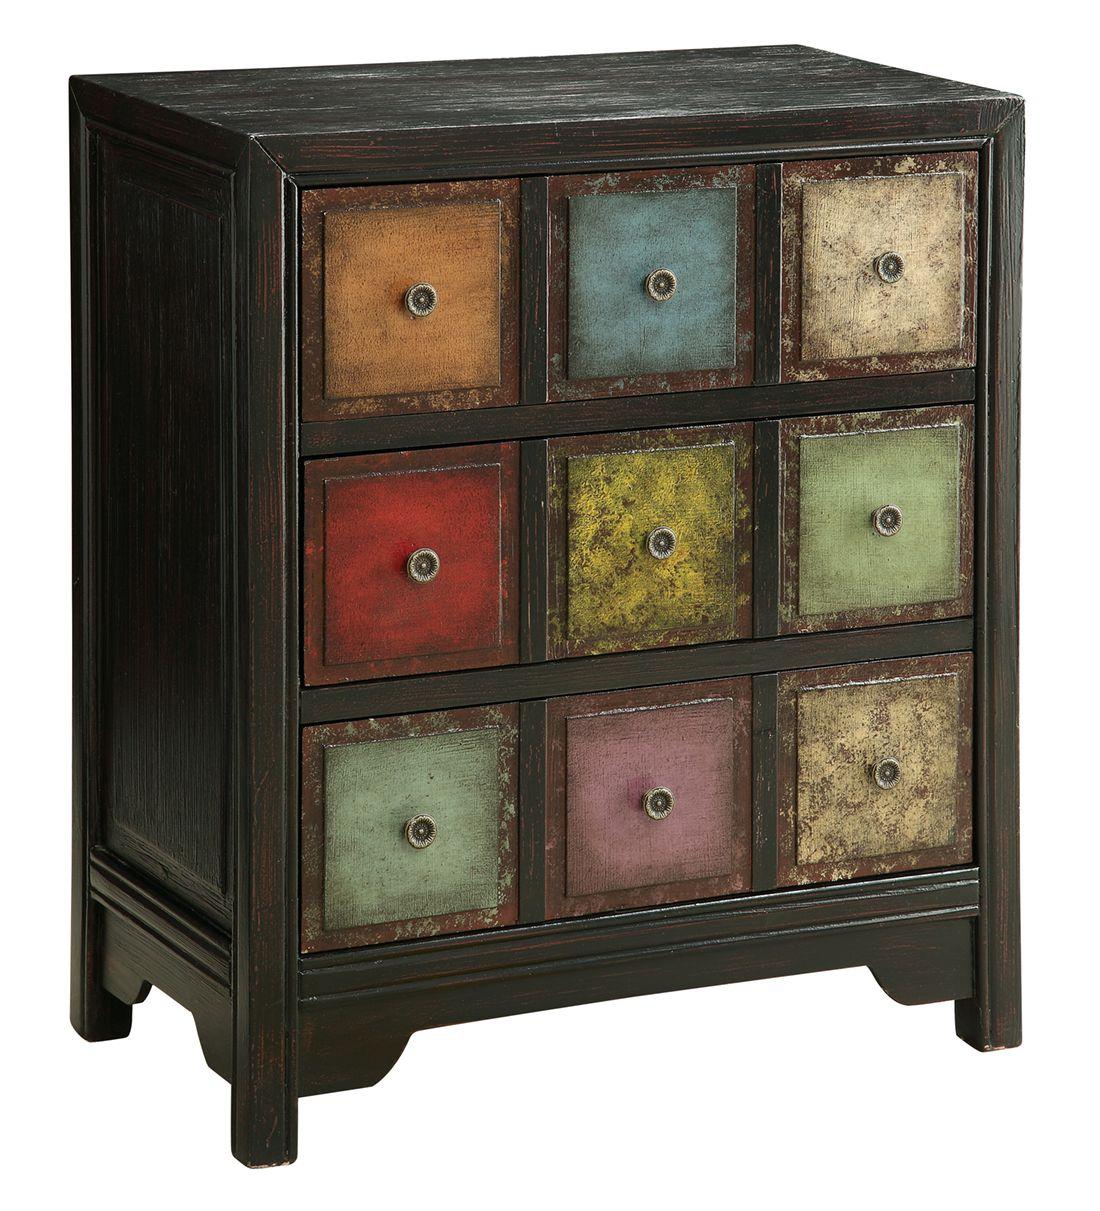 Pin On Restored Furniture Ideas